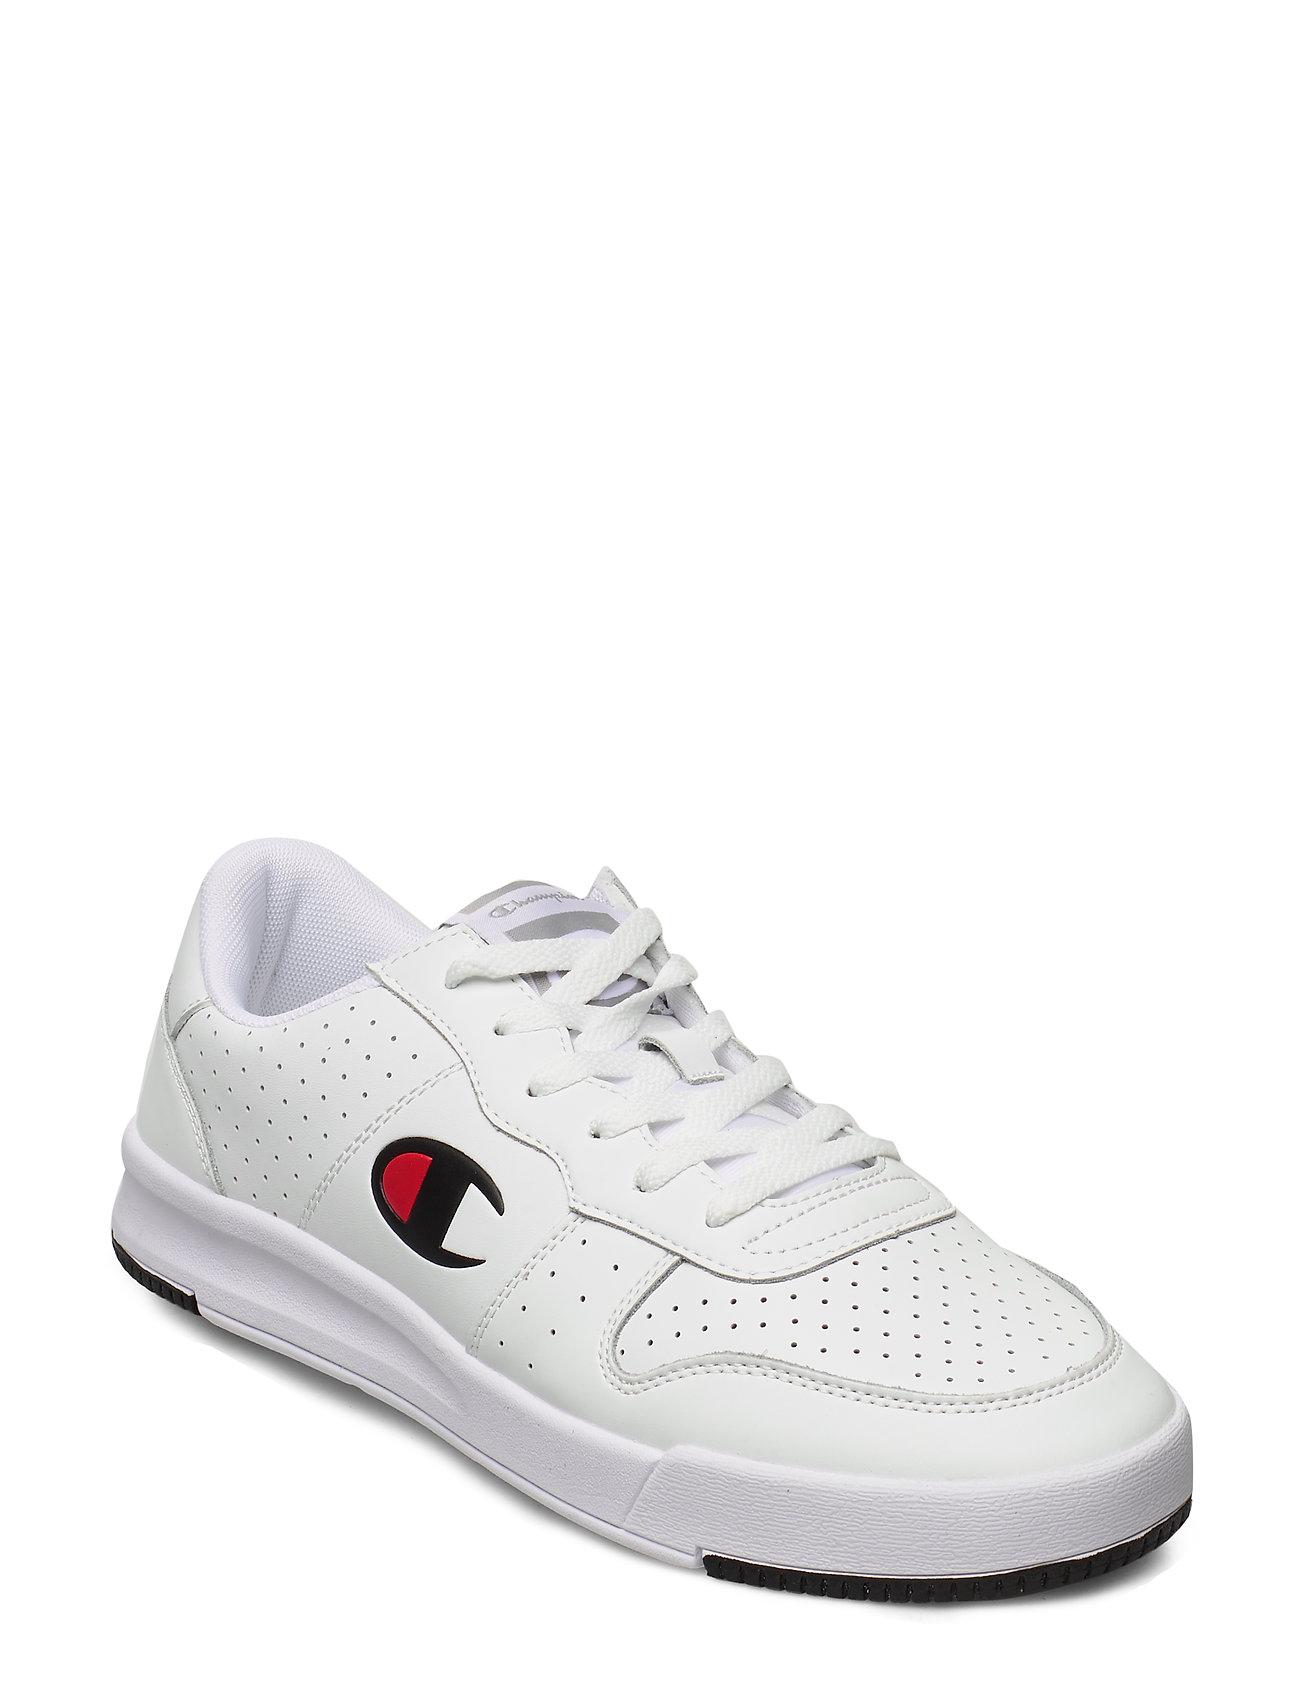 Image of Low Cut Shoe Rls Low-top Sneakers Hvid Champion (3362108089)